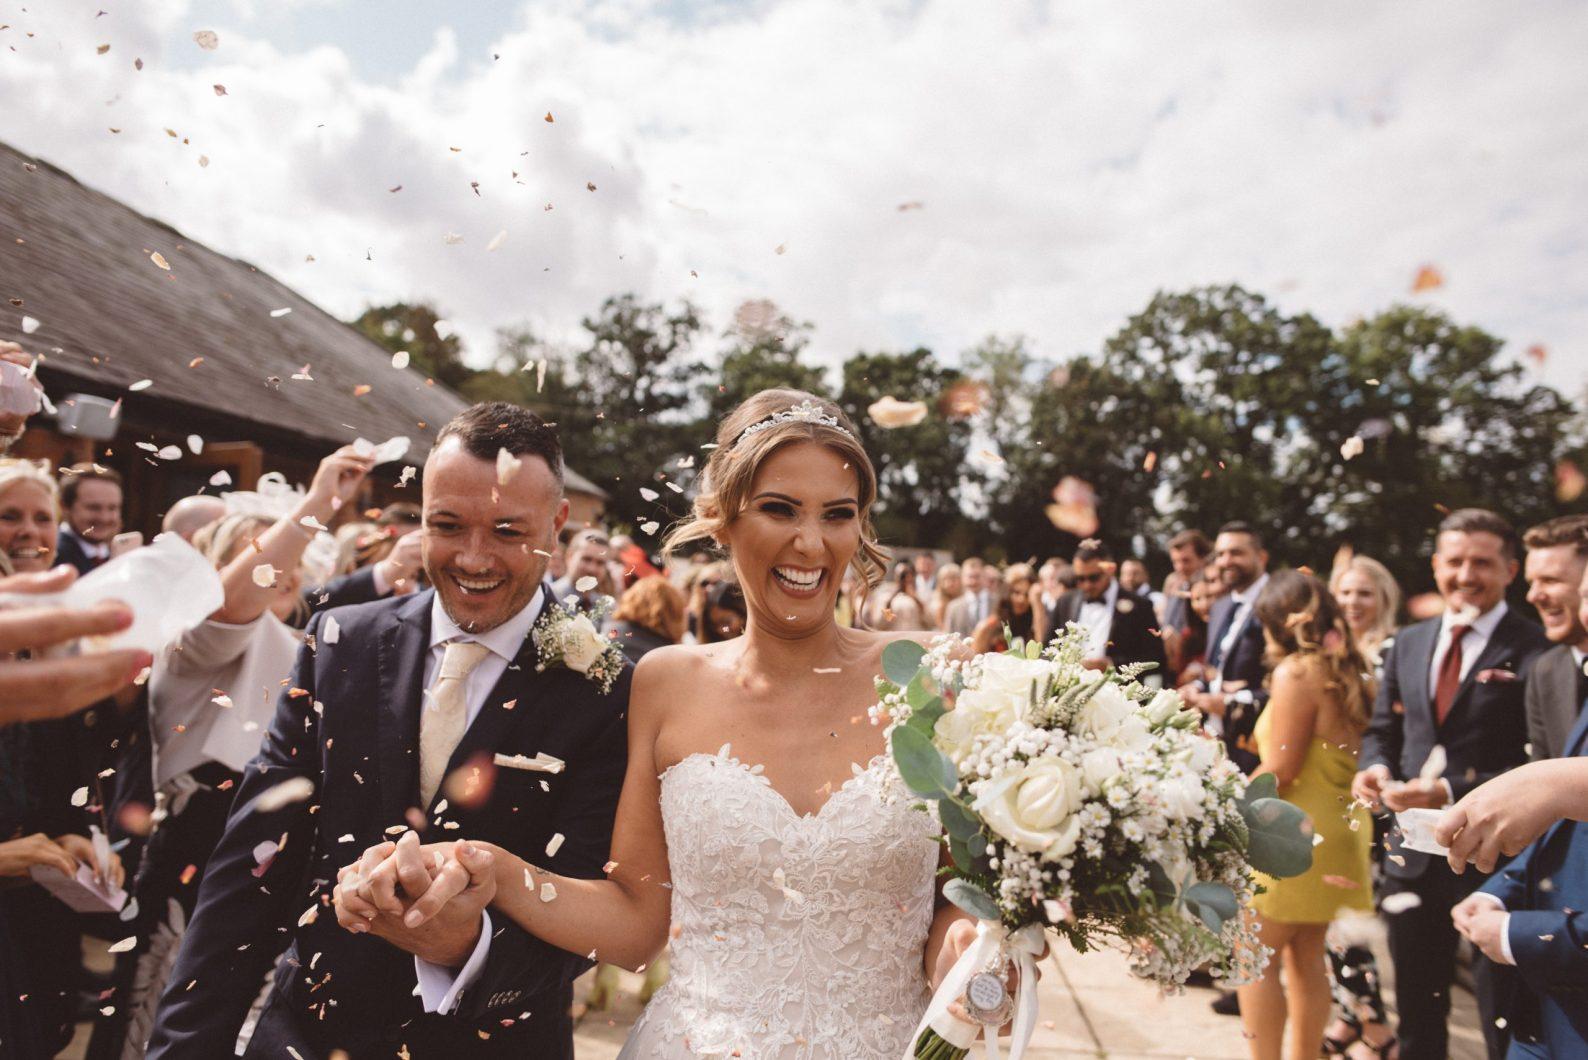 Wedding photographer Keythorpe Manor